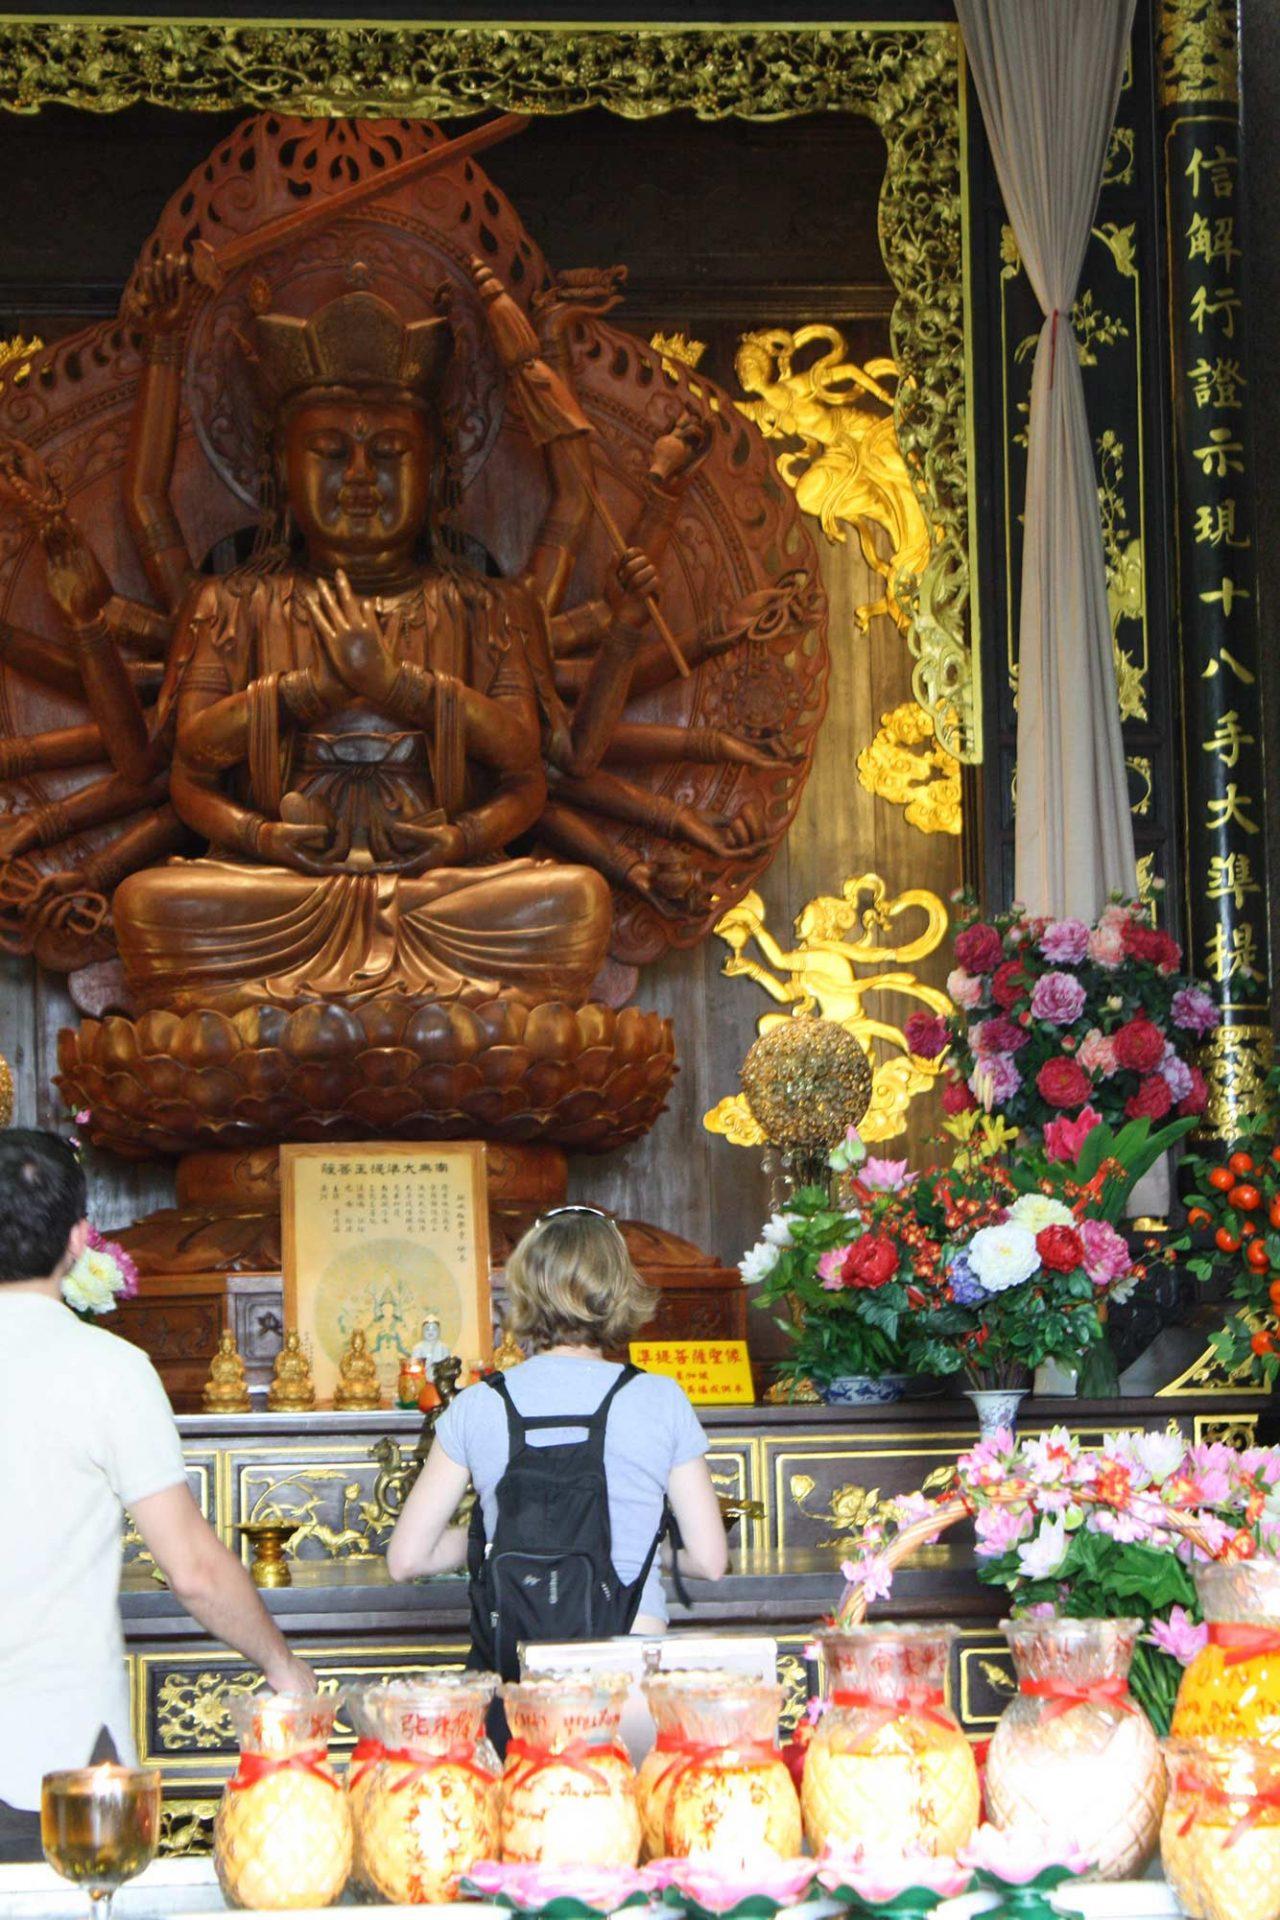 Penang bouddha buddha statue temple Kek lok si